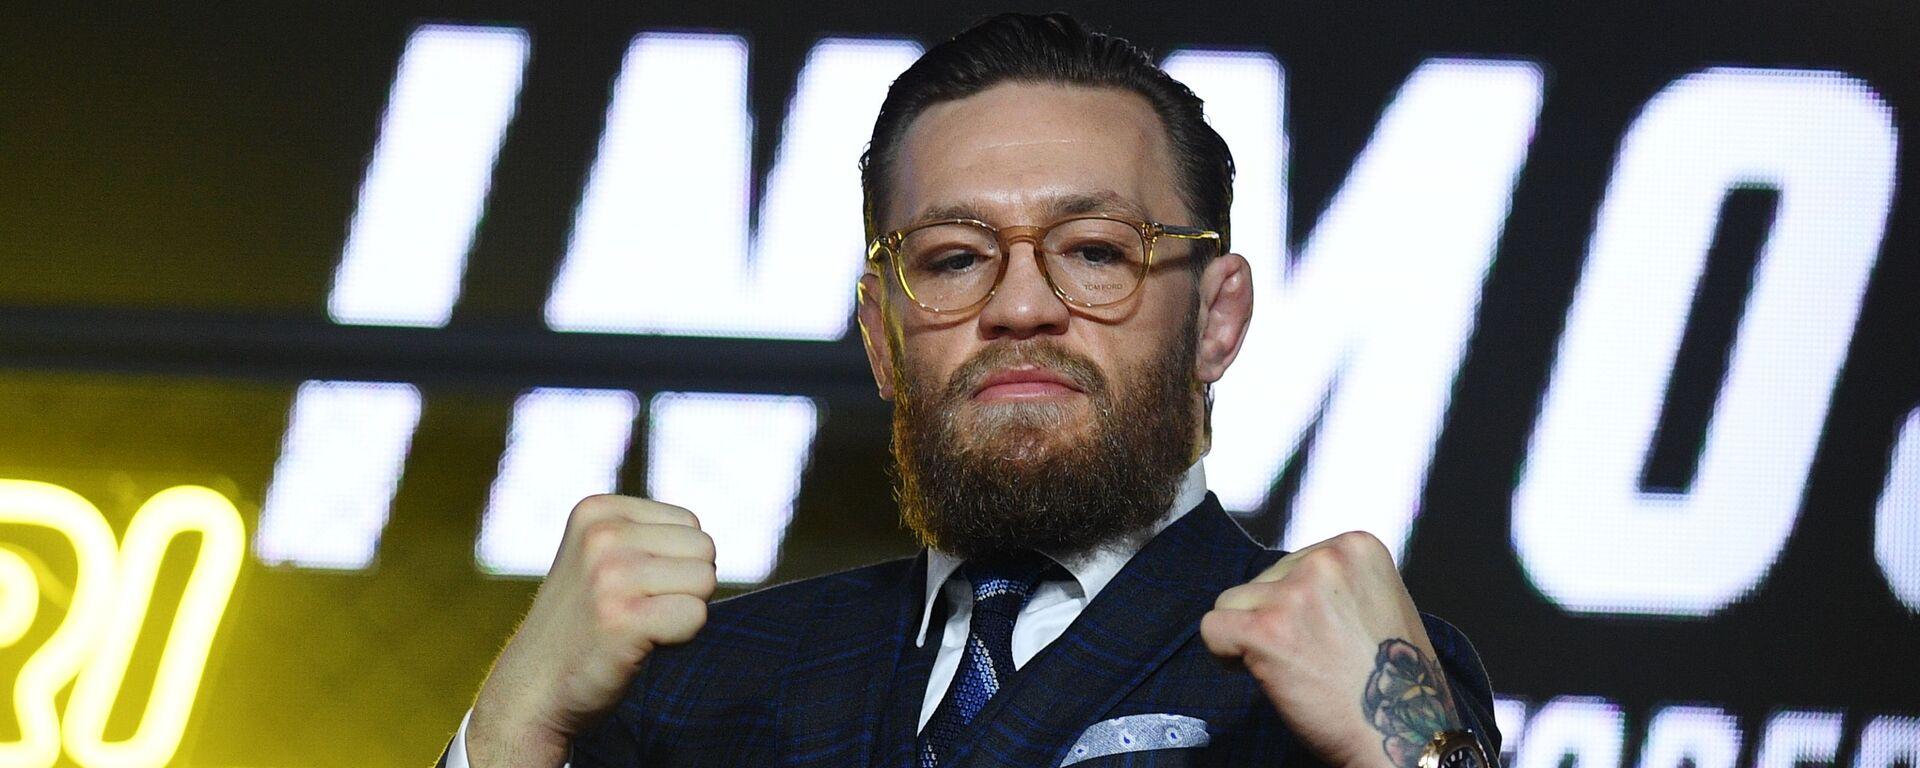 Боец UFC Конор Макгрегор - Sputnik Беларусь, 1920, 06.05.2021